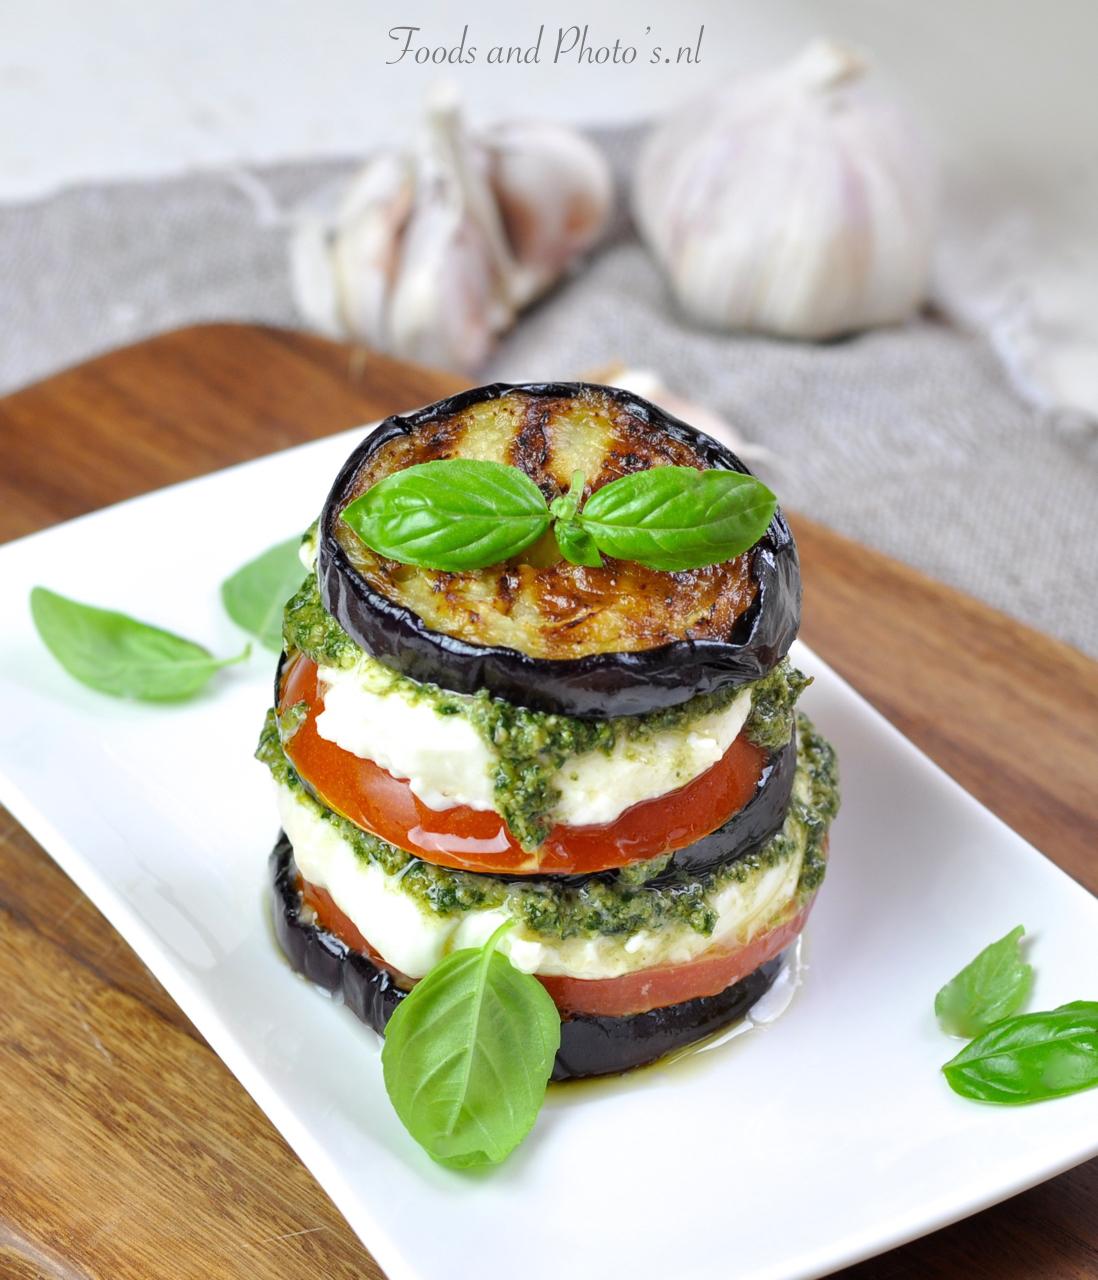 Verrassend Torentje van tomaat, mozzarella en aubergine: mozzarella SB-89